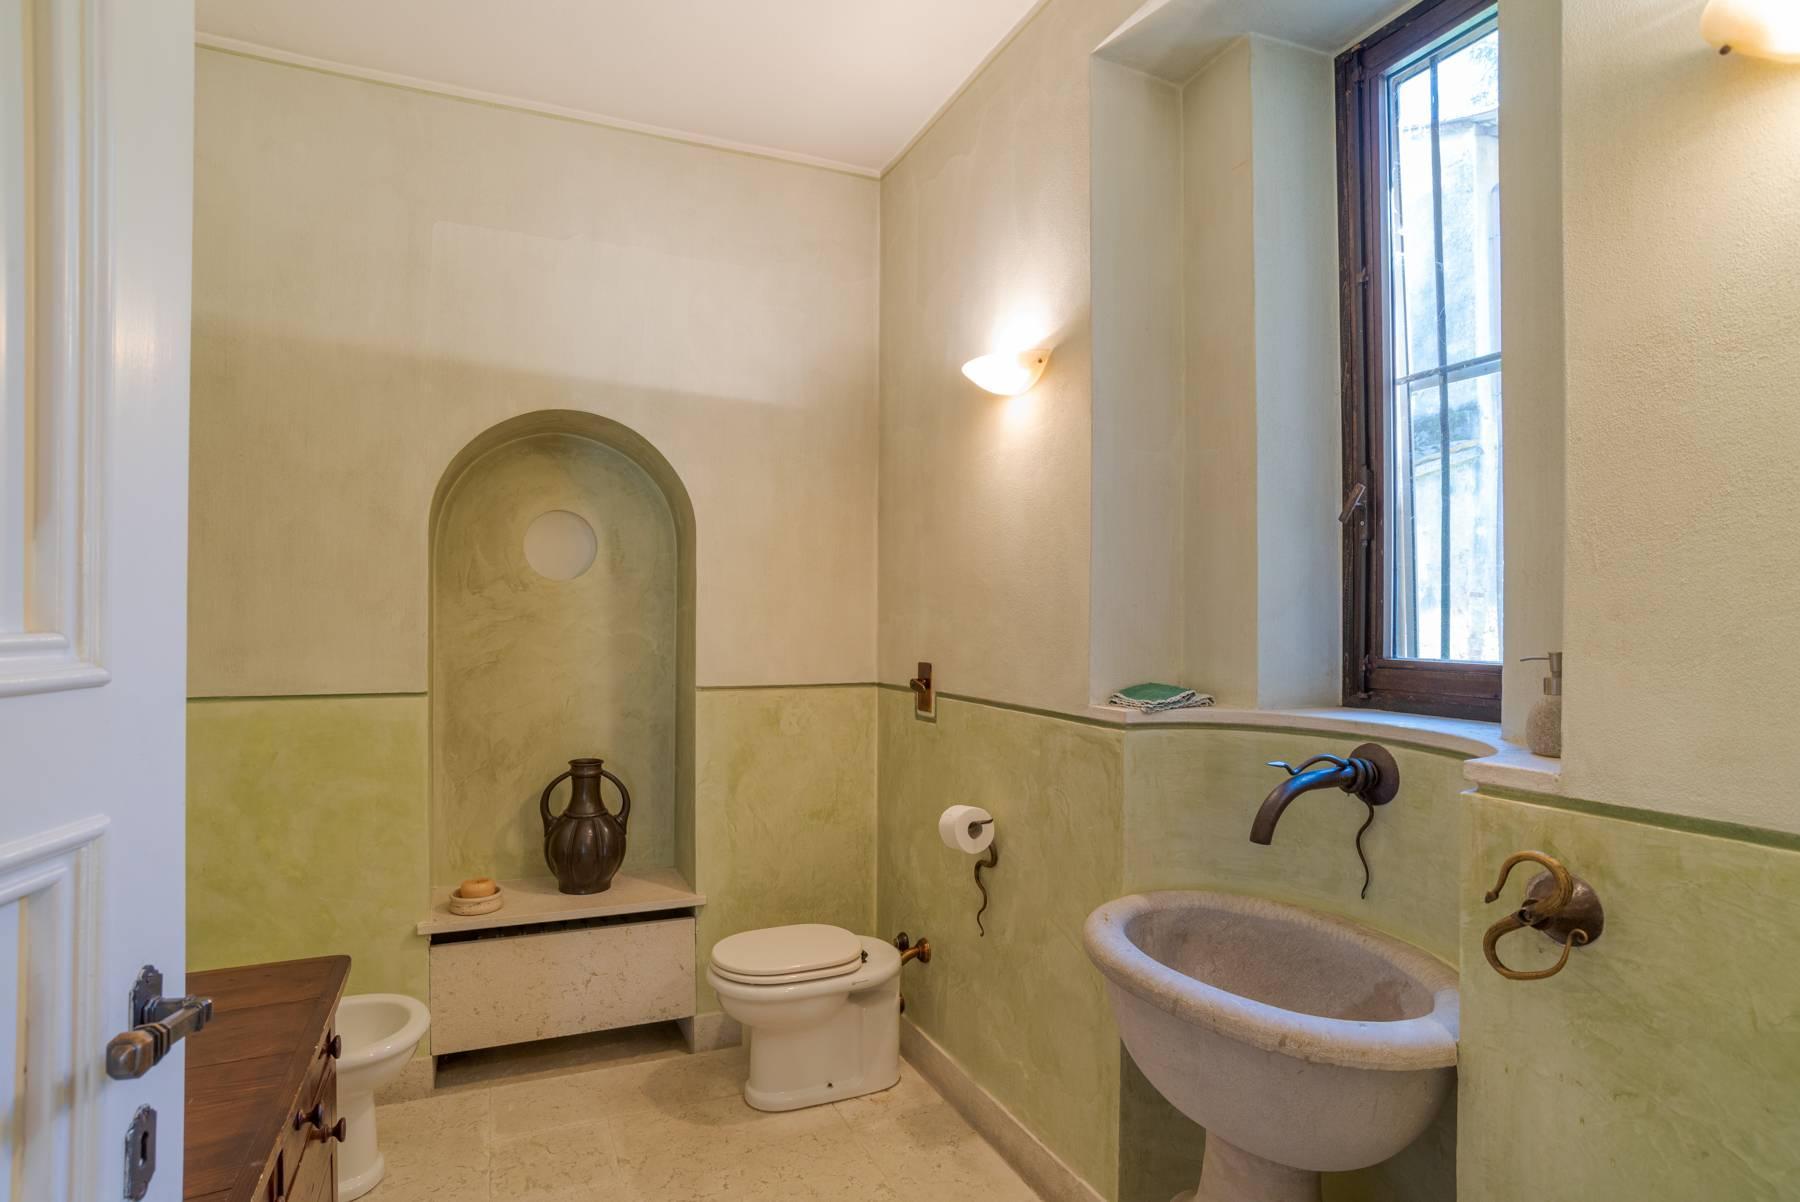 Magnifica proprietà immersa nel verde a Pavia - 10